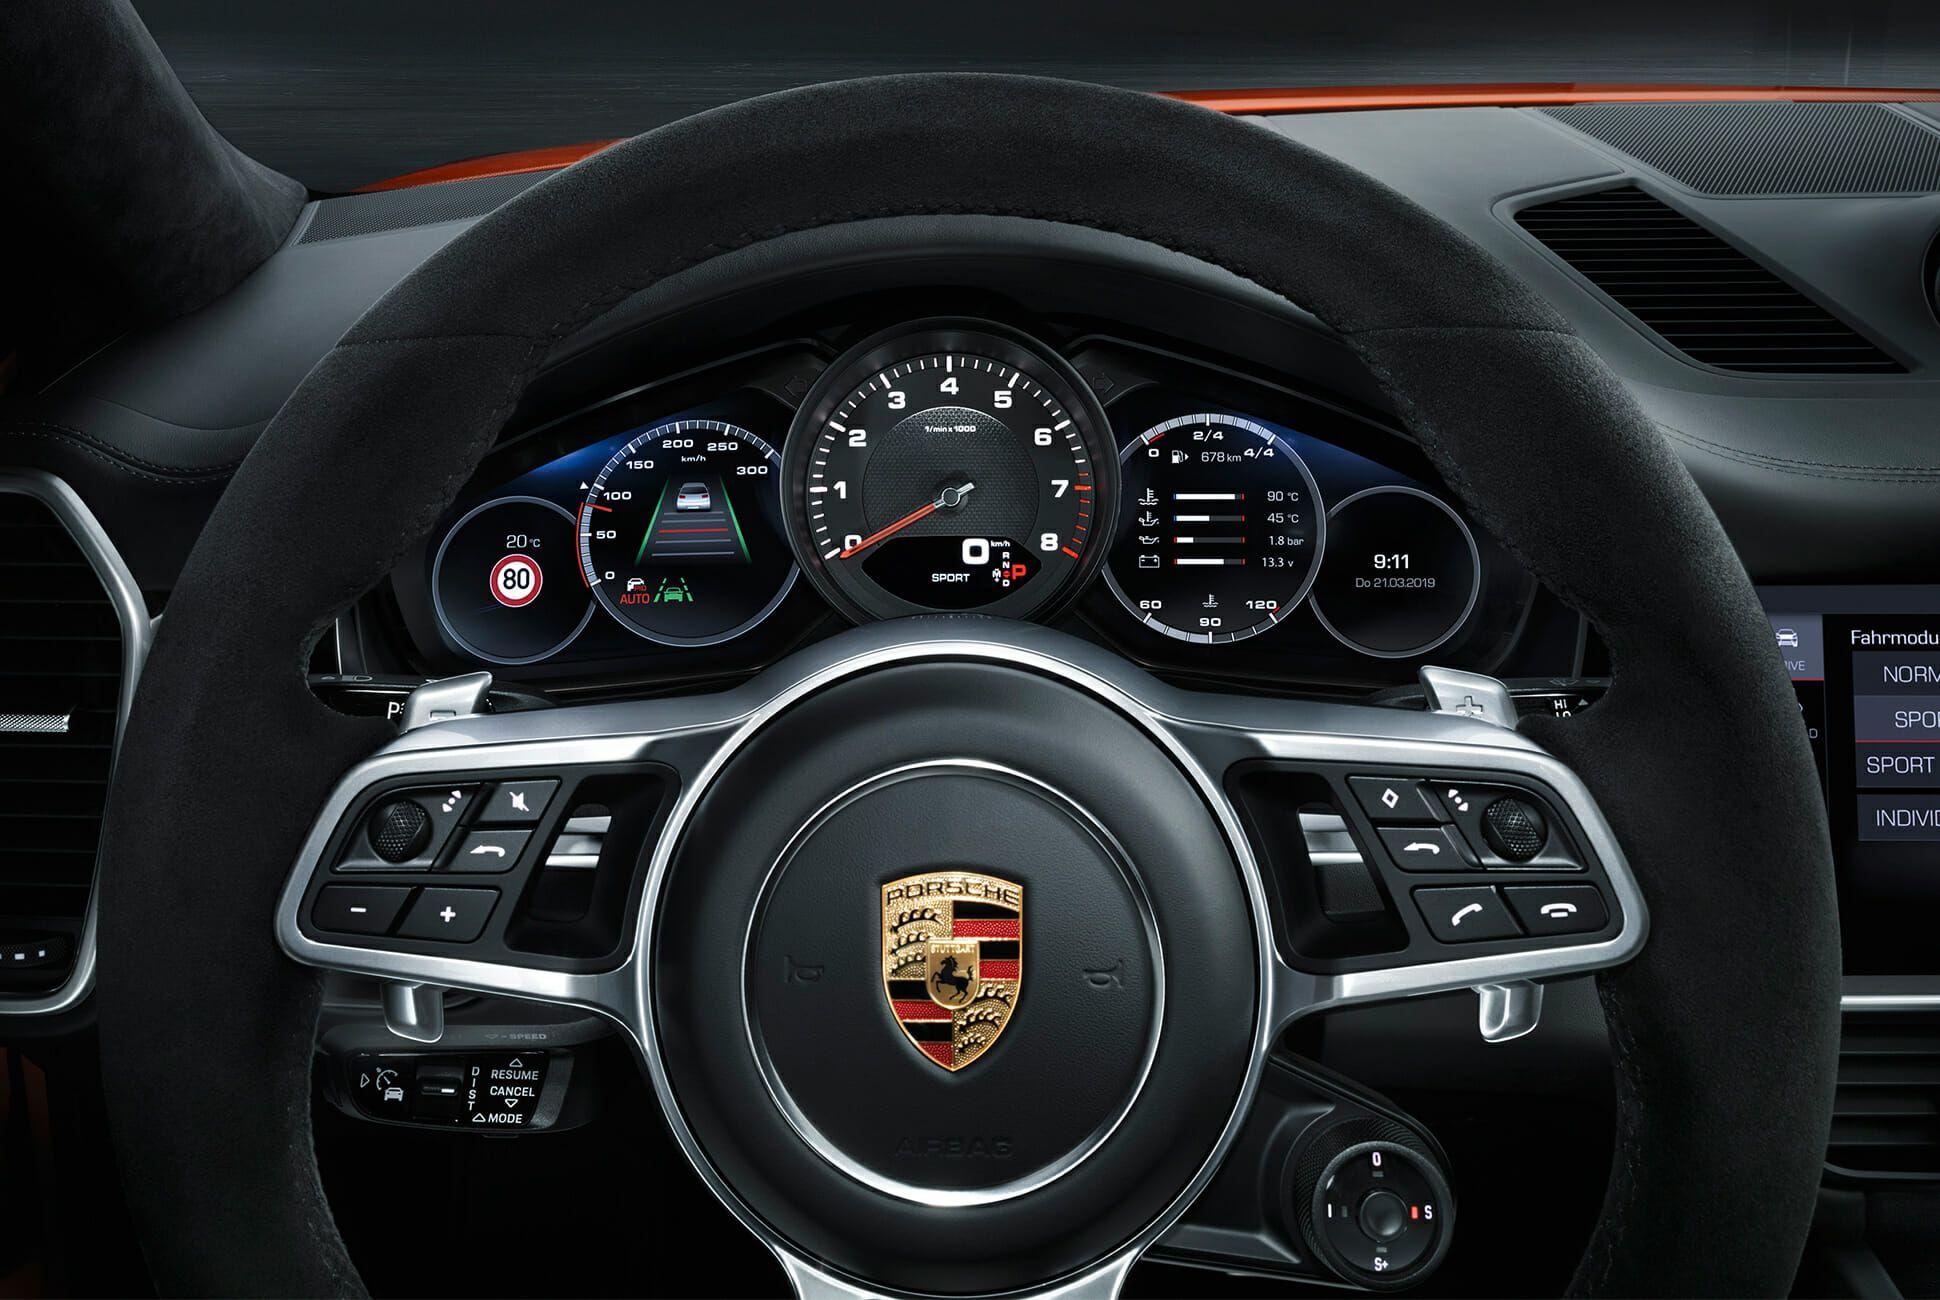 2020-Porsche-Cayenne-Coupe-gear-patrol-slide-6